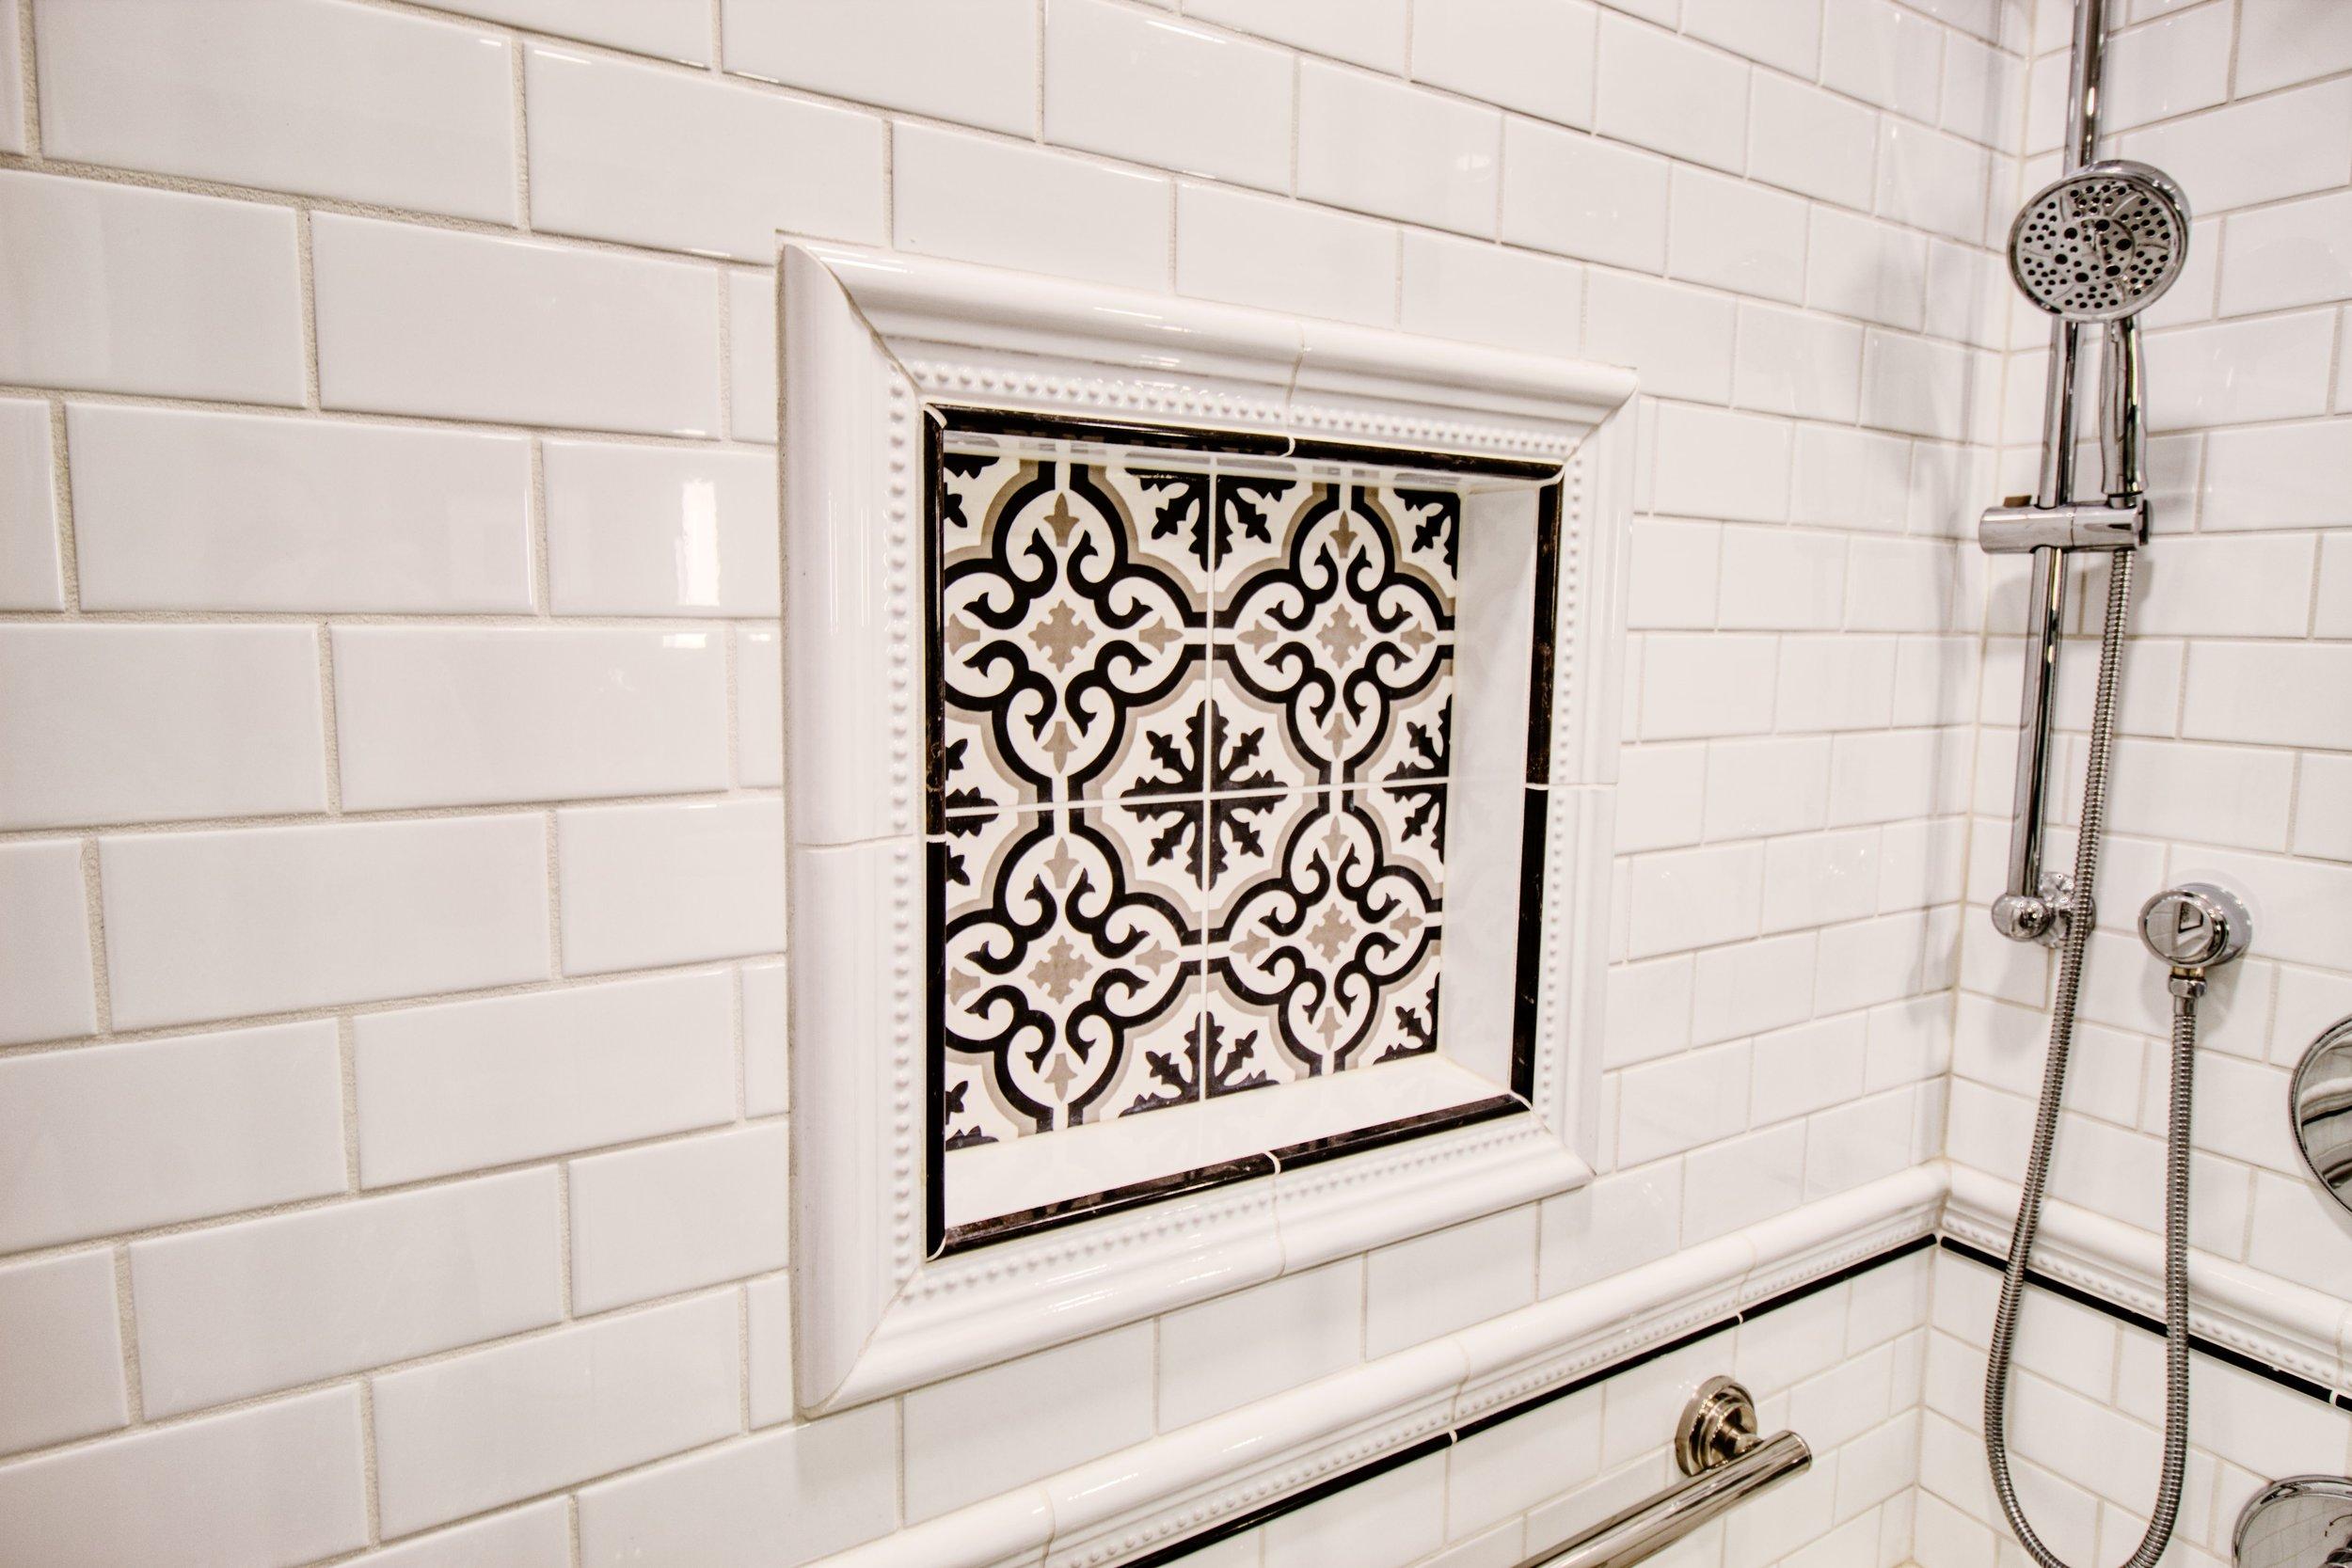 Intricate Tile Work